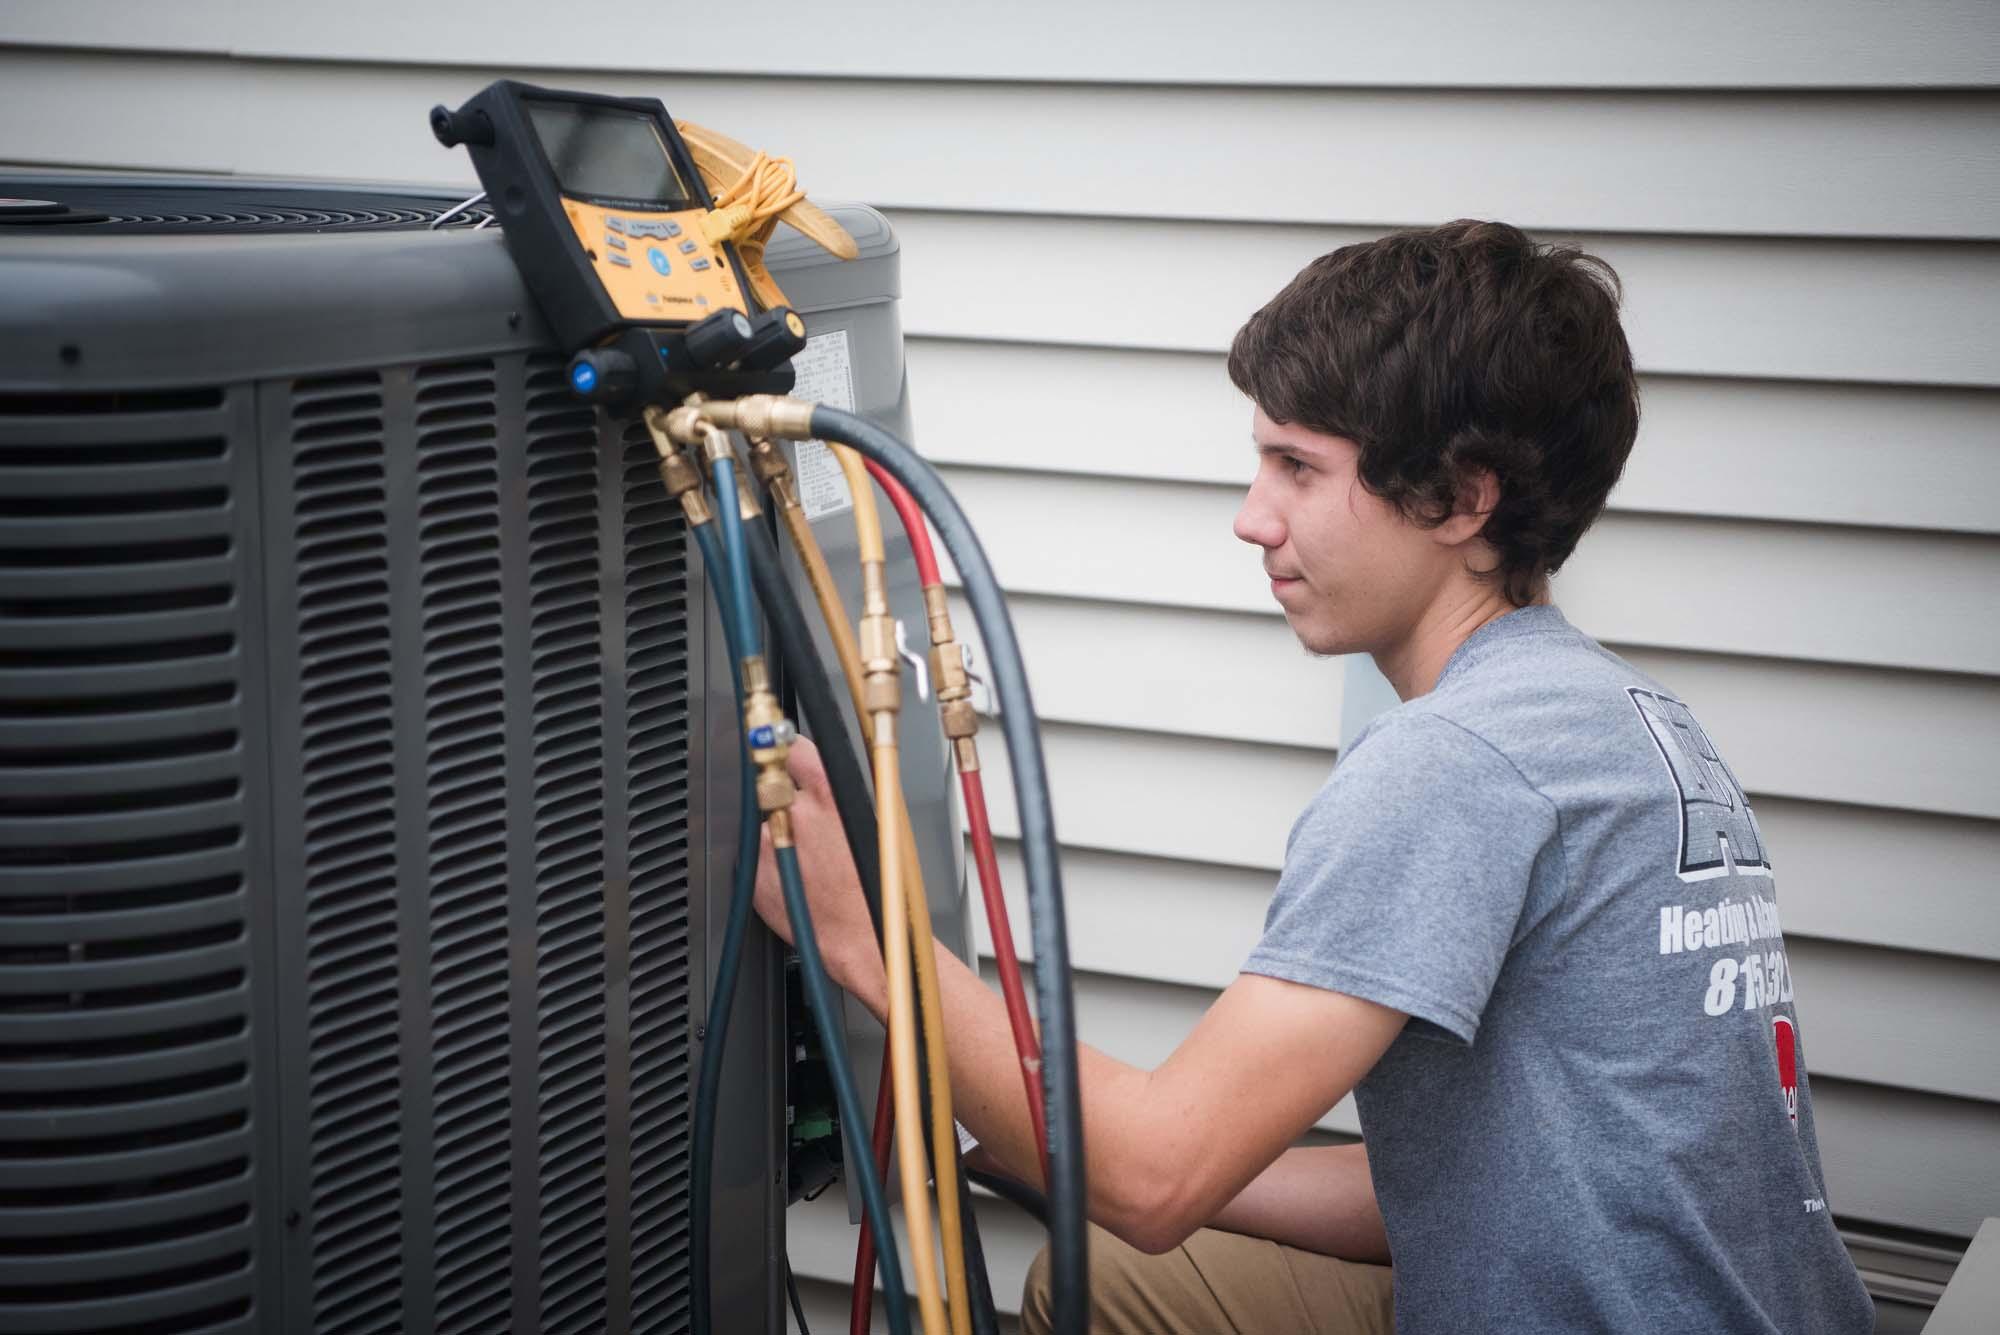 17-09-13_SJP_ADLHeating&Cooling_0103